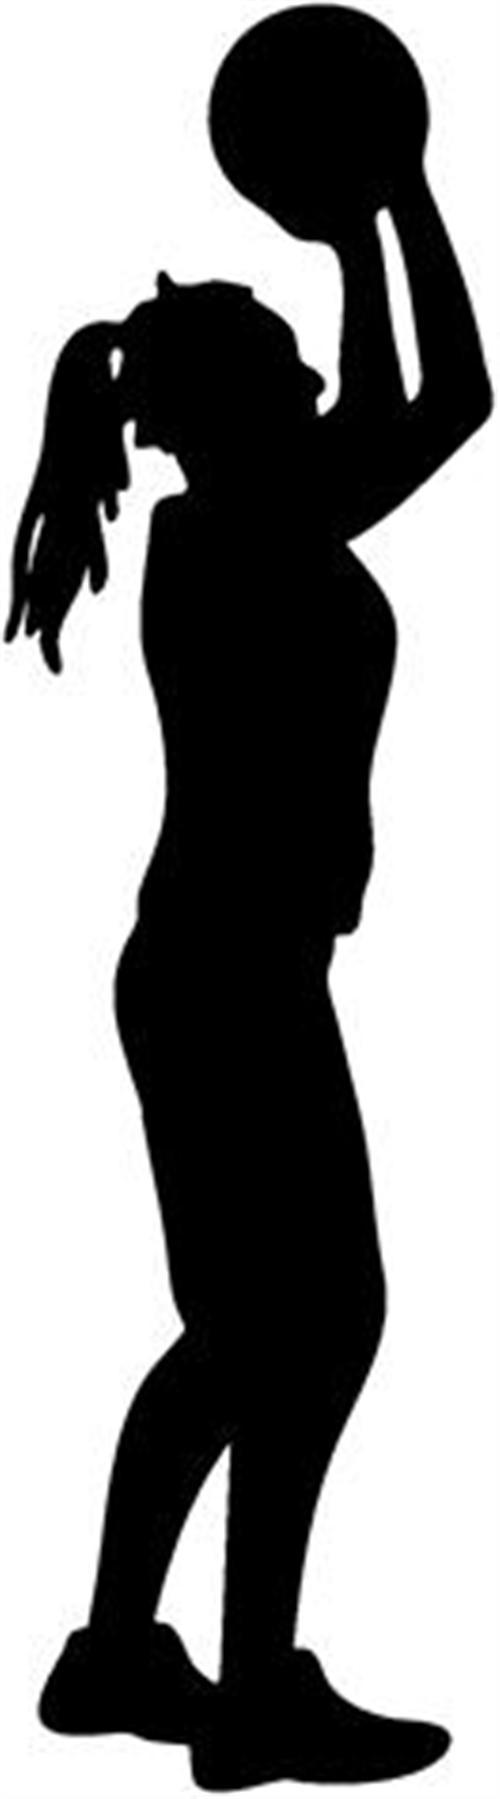 girl basketball player silhouette at getdrawings com free for rh getdrawings com Woman Basketball Player Clip Art Printable Basketball Clip Art